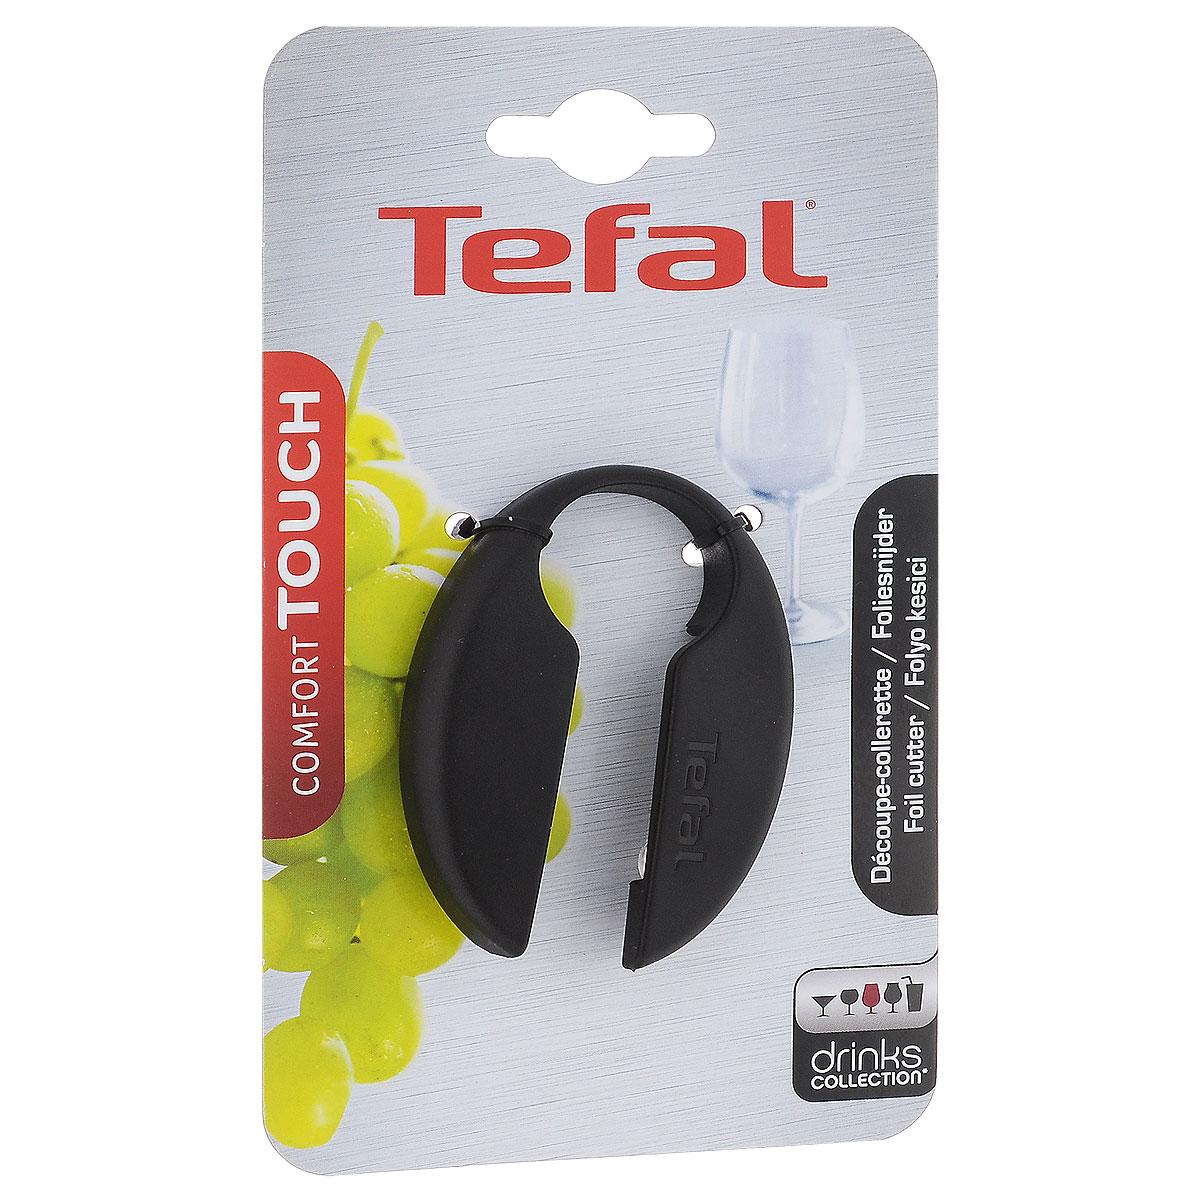 ������ ��� ������ ������ Tefal Comfort Touch, ����: ������ - TefalK0692914������ ��� ������ ������ Tefal Comfort Touch ���������� �� �������� � �������. ������ ������� ���������� ������ ������� ��� ����������� ��������� � ����� ������ � ������� ��� ������ ������.